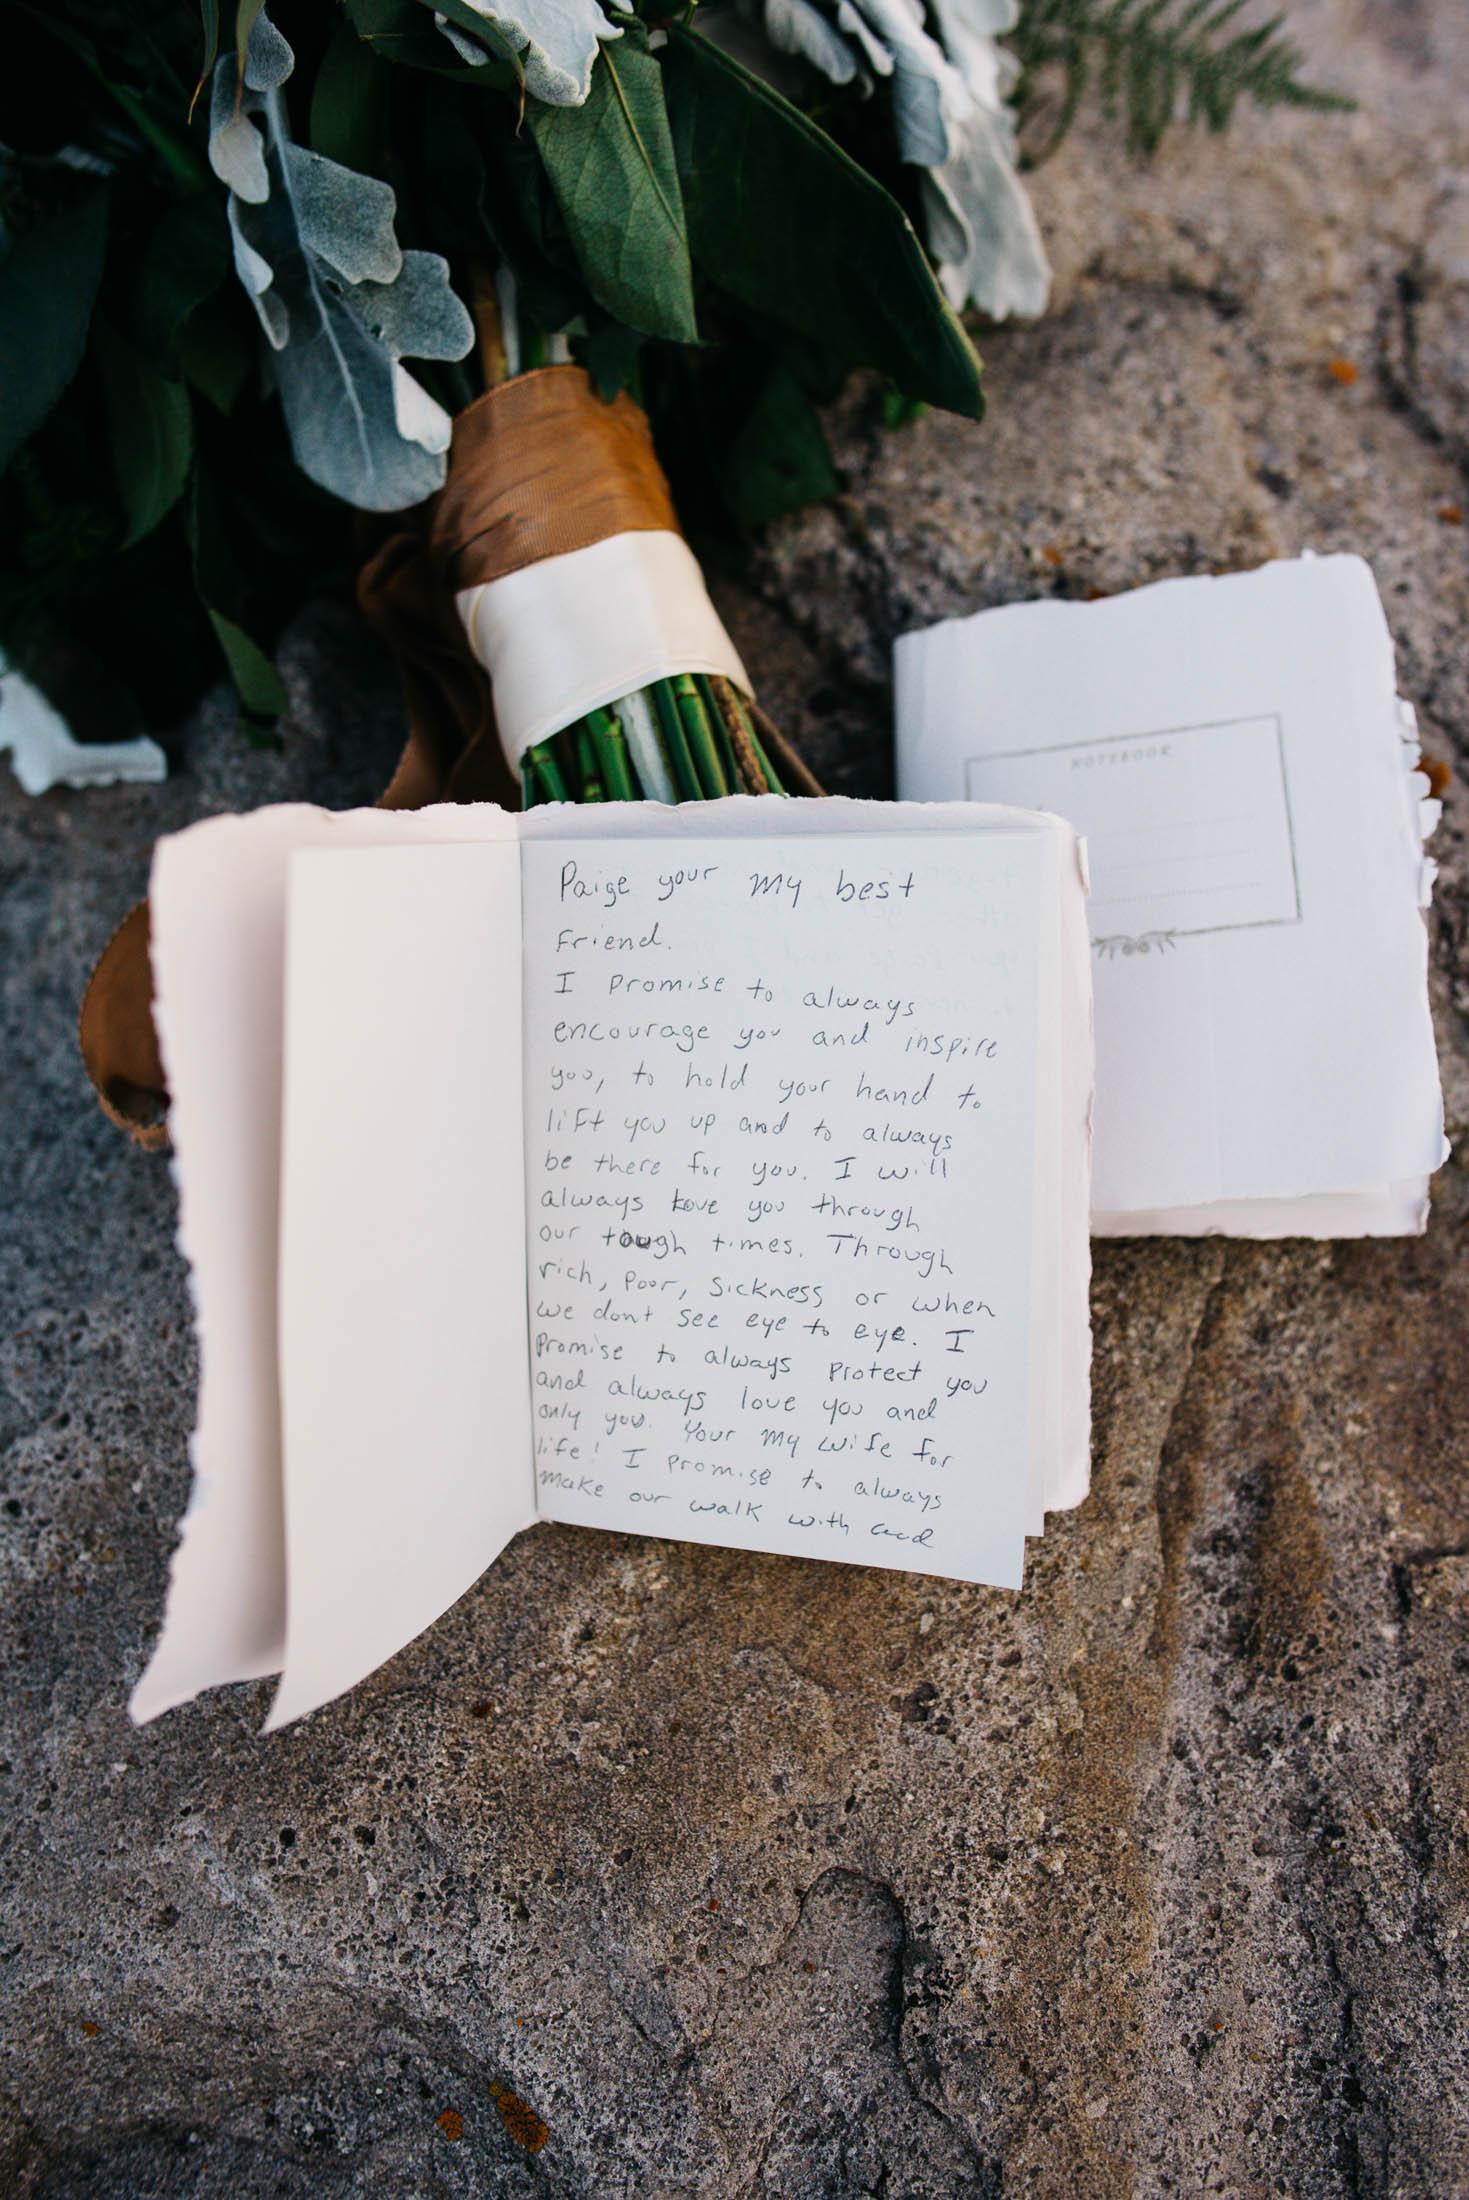 63elopement-photographer-colorado-telluride-winter-wedding-mountain-wedding-photographer-paige&chad-0768-2.jpg